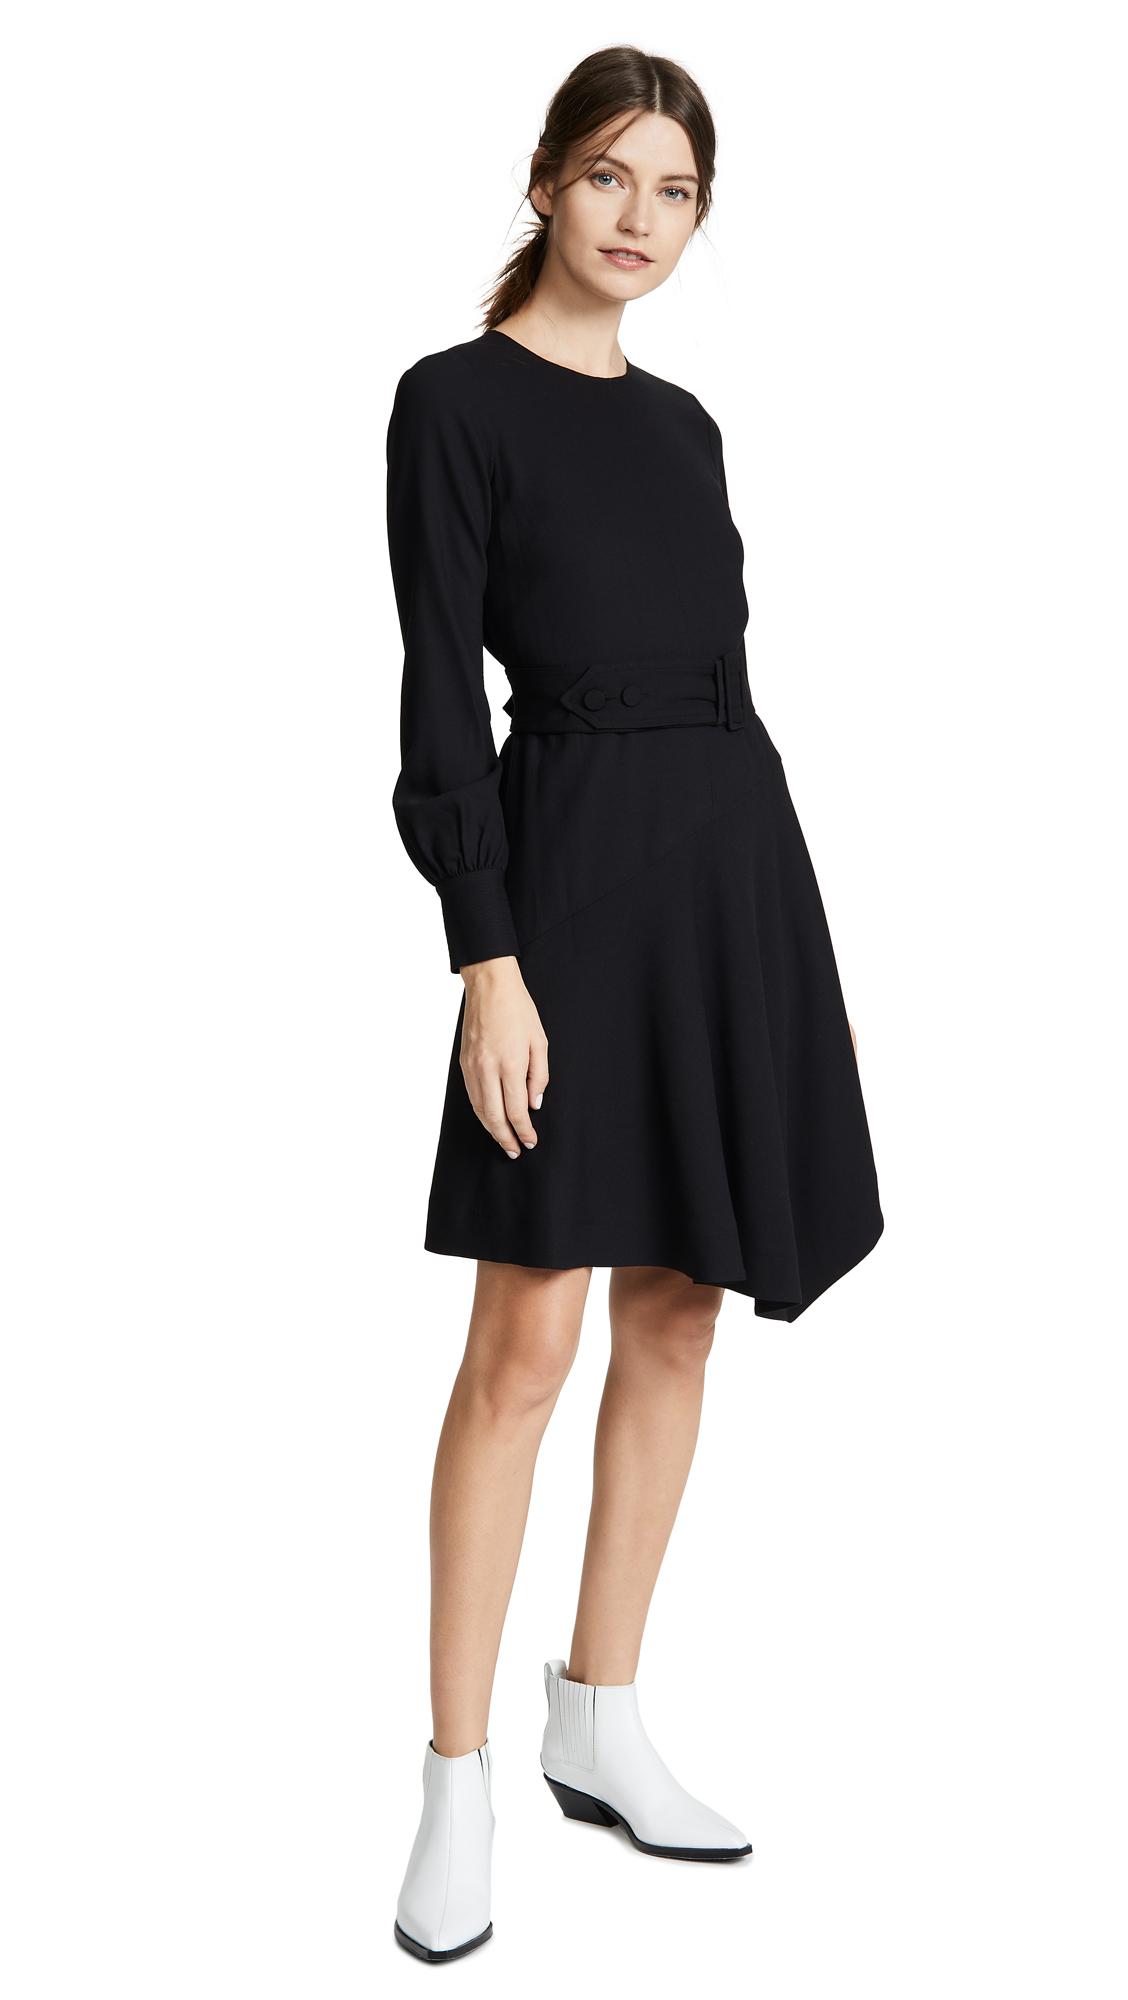 Belted Asymmetrical Dress, Black